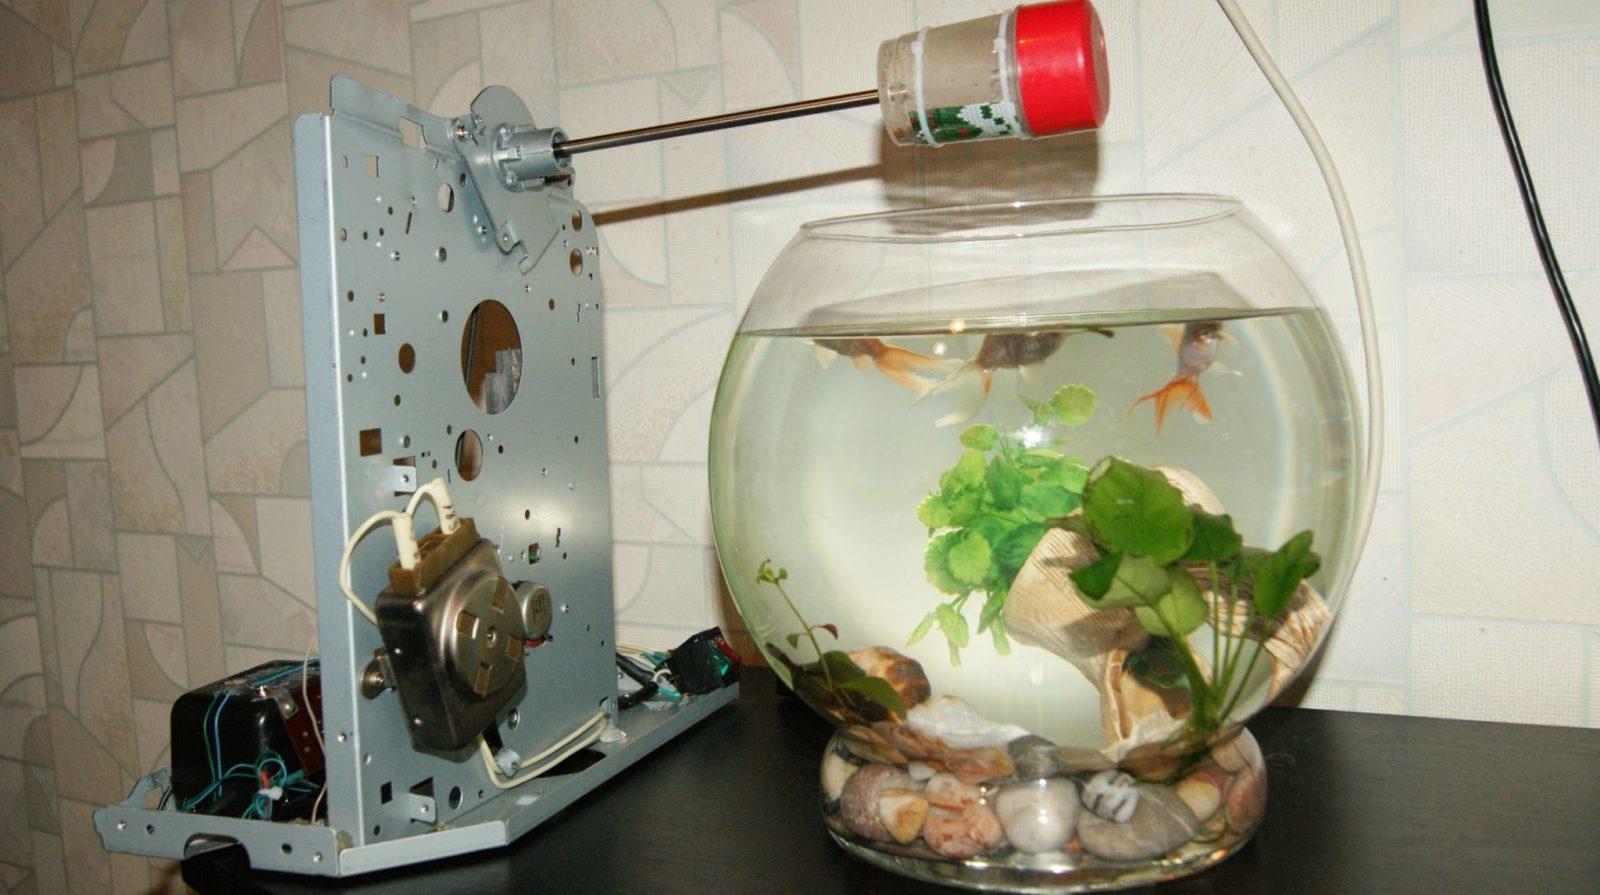 Кормушка для рыбок в аквариуме своими руками фото 936